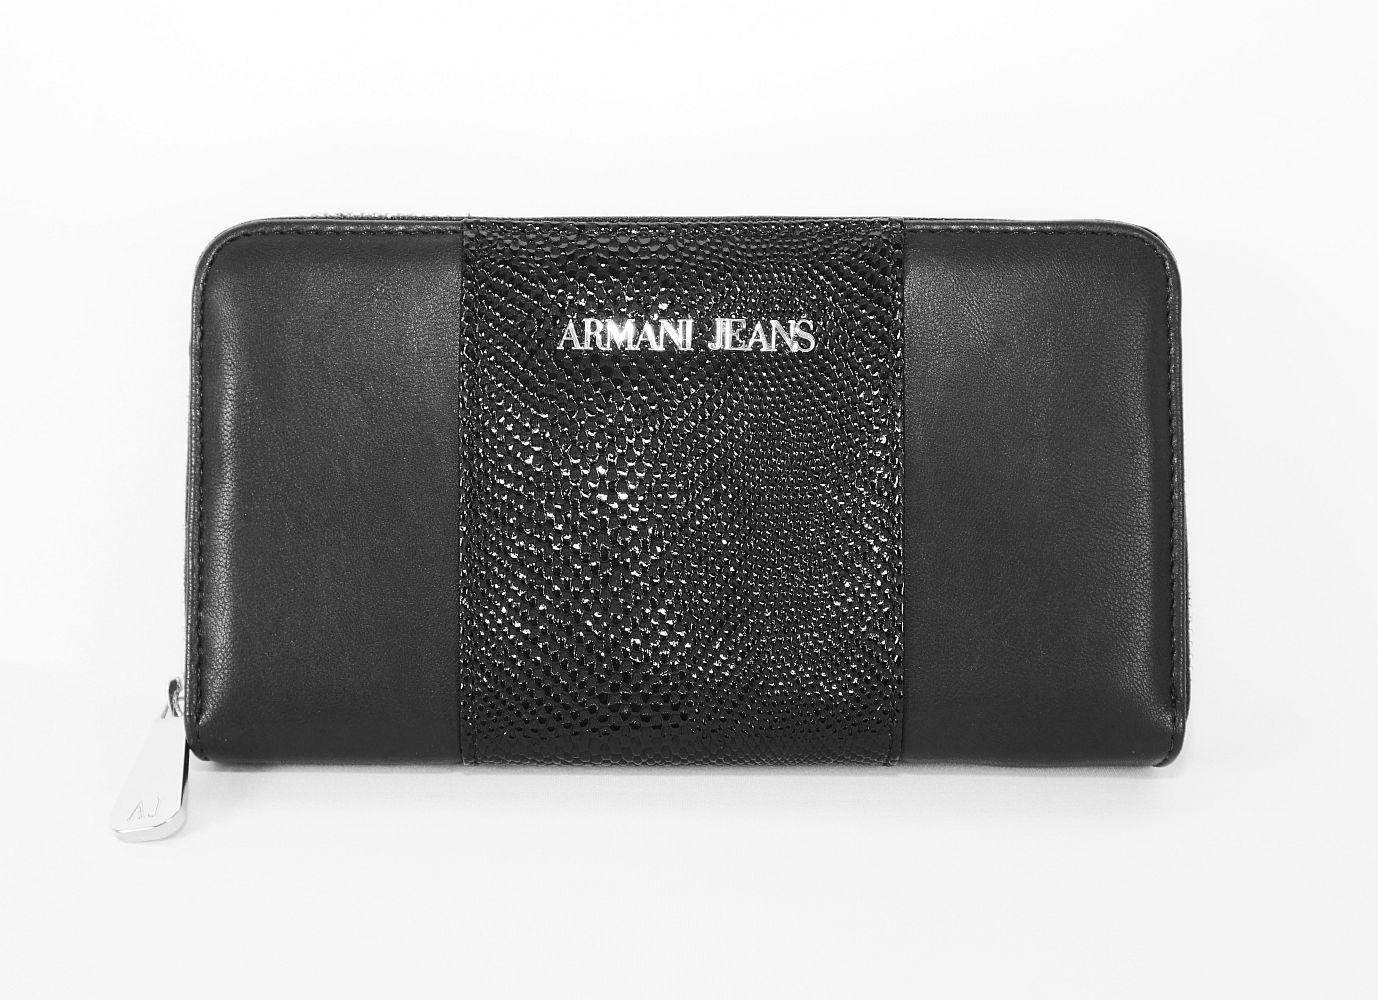 Armani Jeans Geldbörse Börse 928032 6A725 00020 Nero HW16-AJn